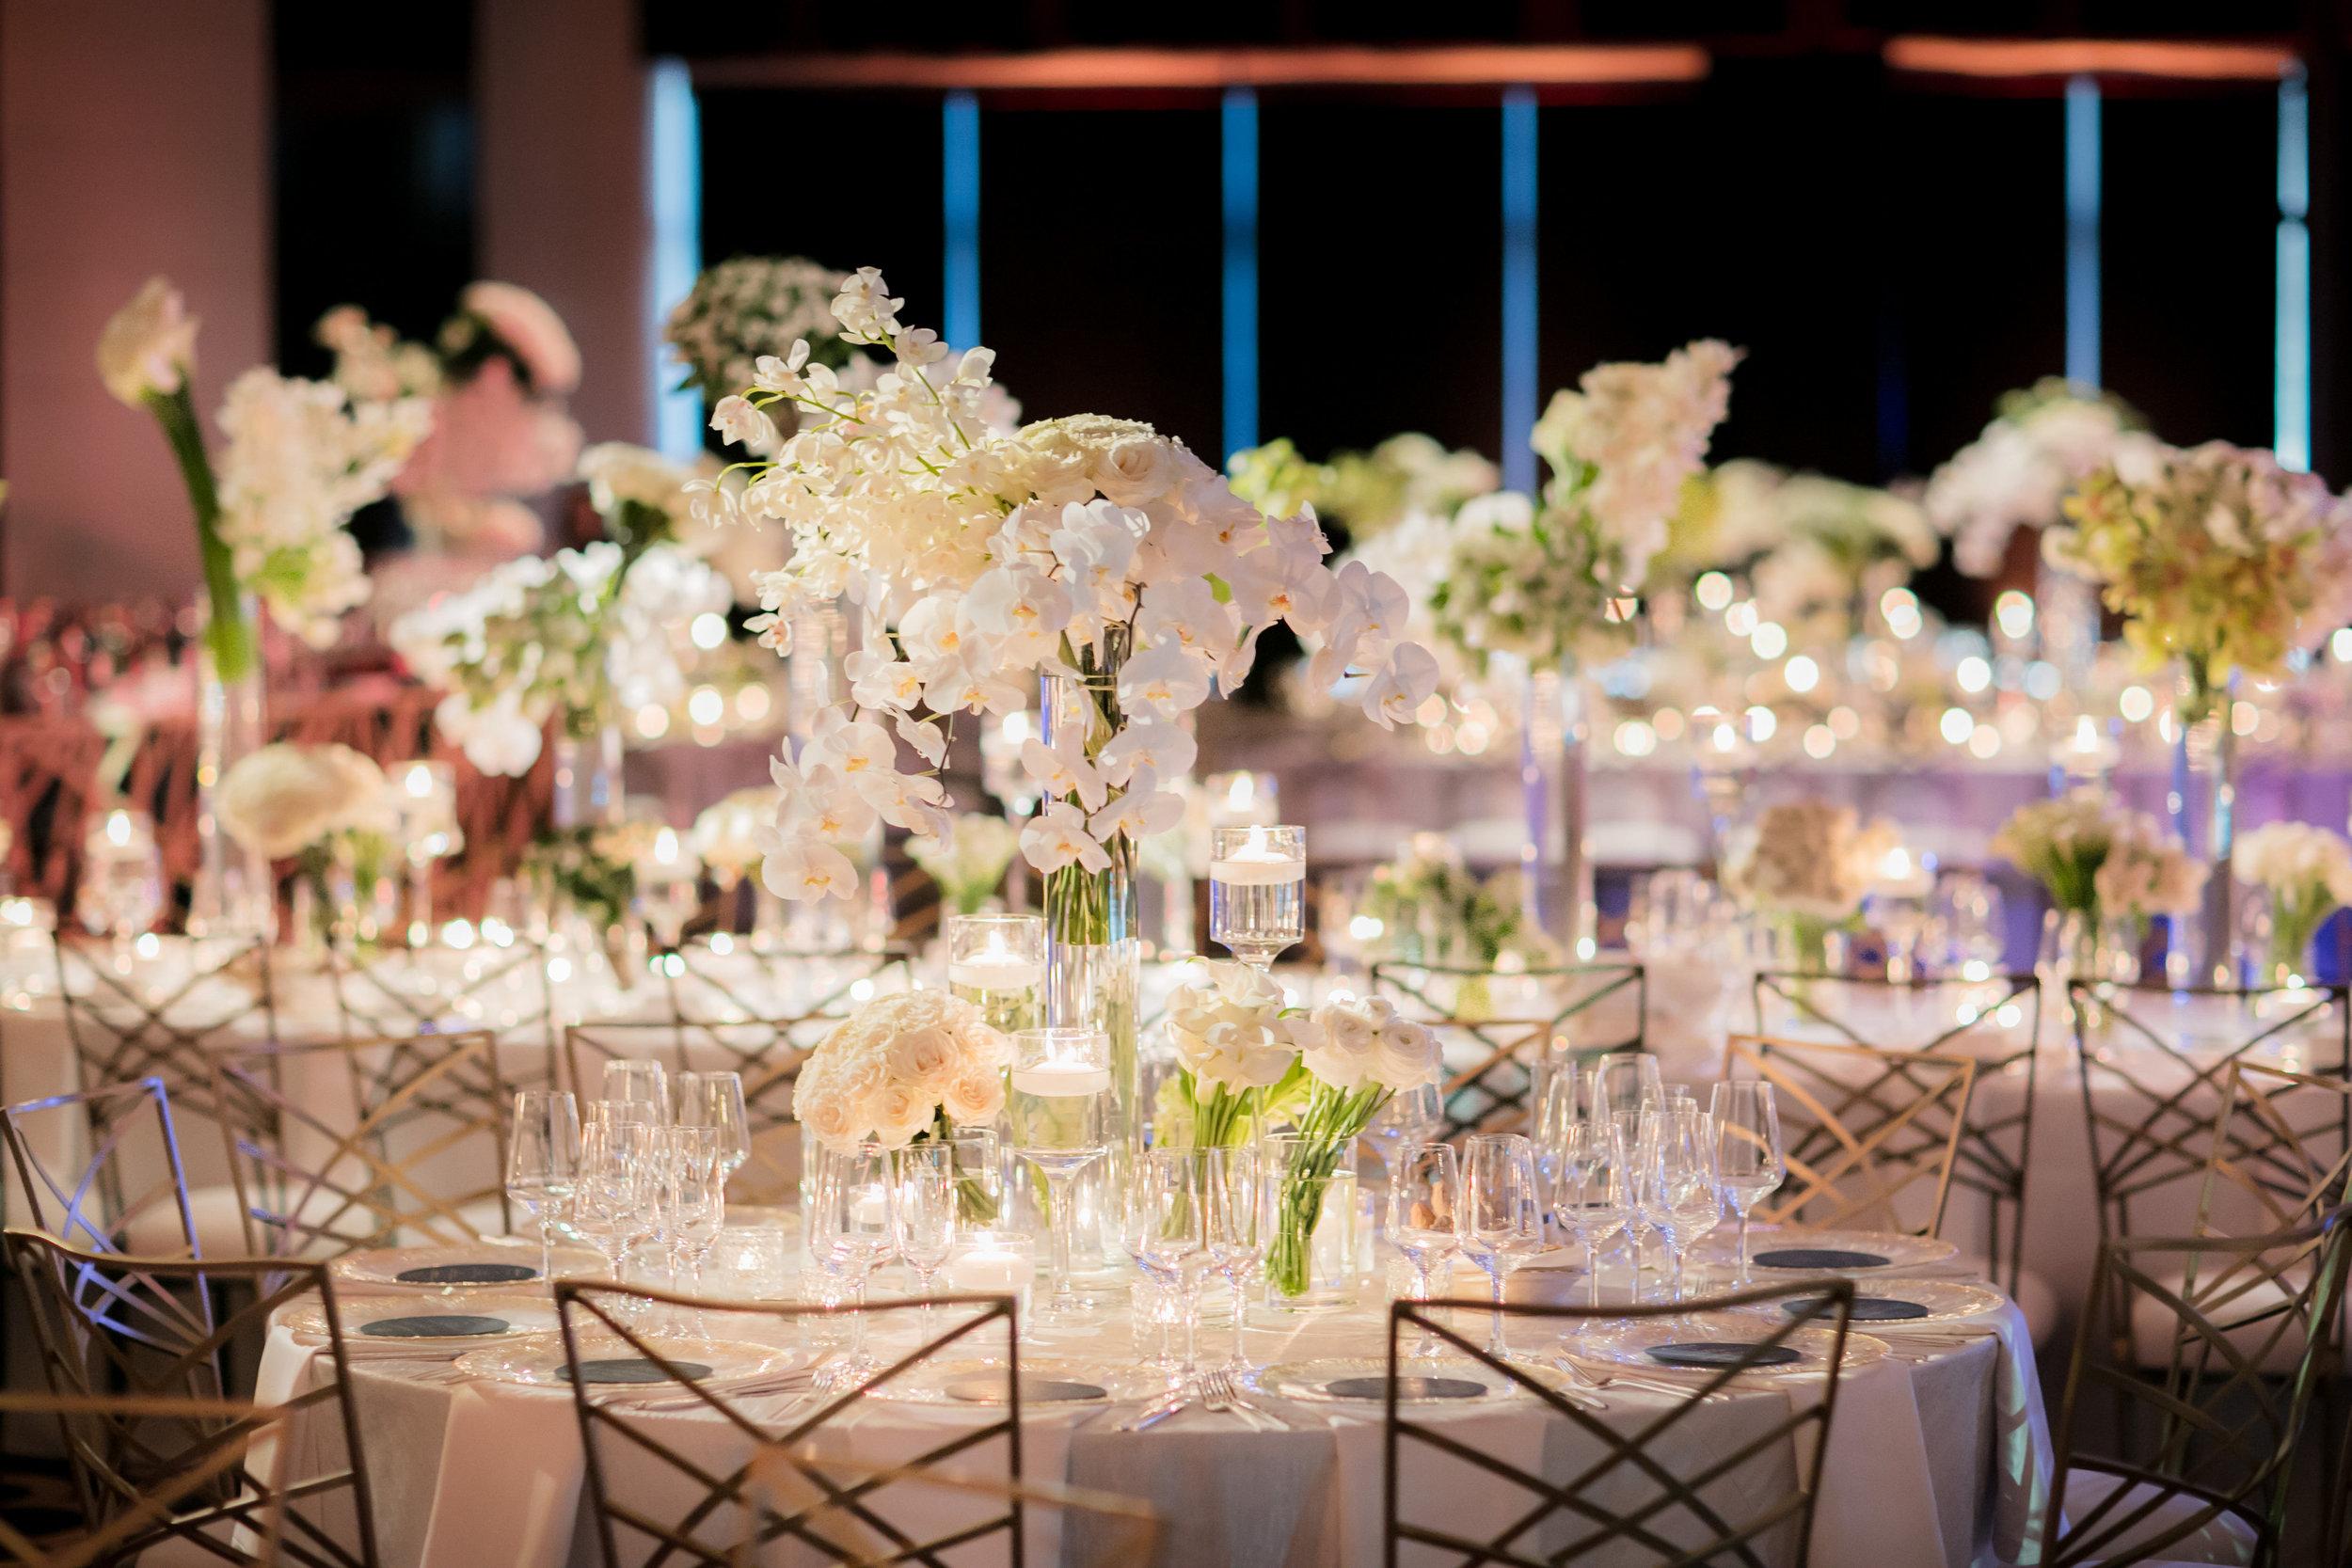 Andrea-Freeman-Events-NY-Wedding-Planner-Mandarin-Oriental-Wedding-12.jpg